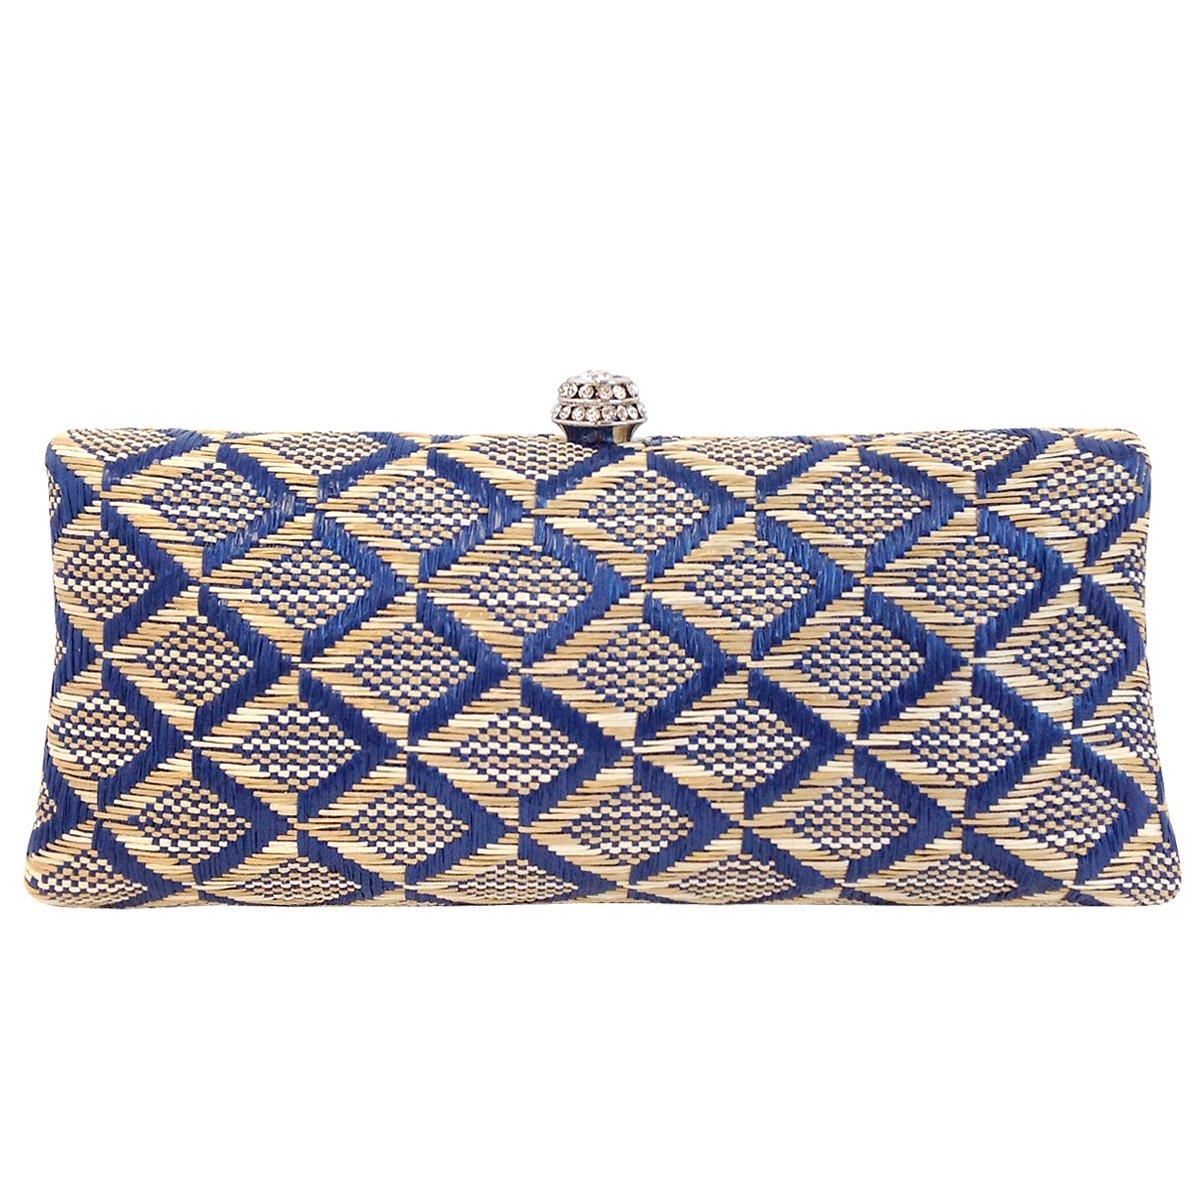 Geometric Patterned Raffia Straw Box Clutch, Blue